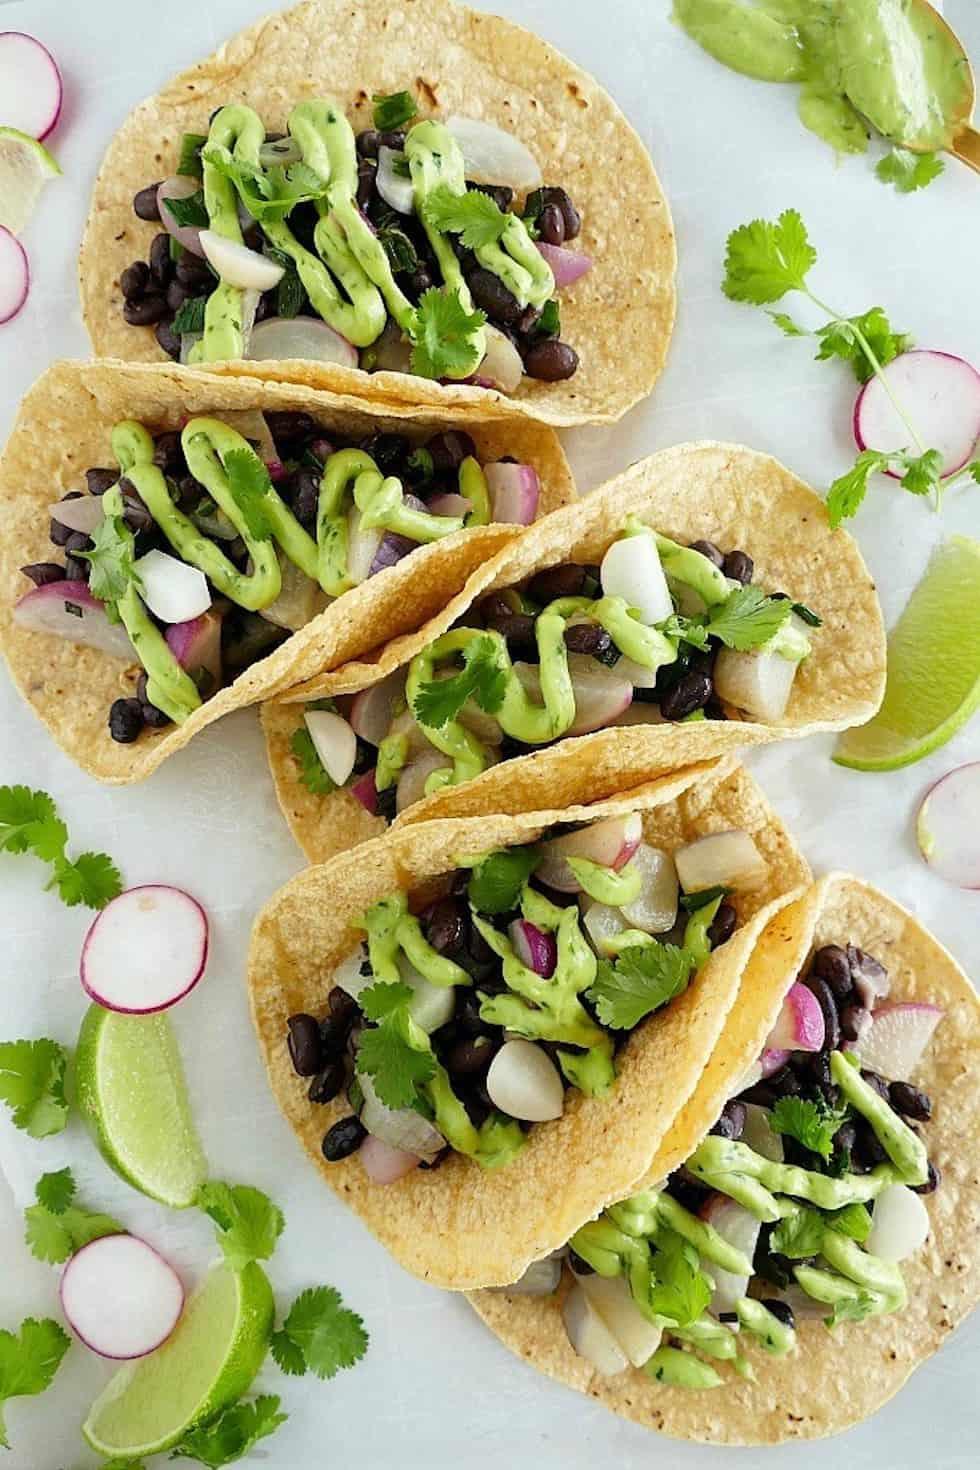 Black bean tacos with avocado crema on white background with limes, radish, and cilantro garnish.